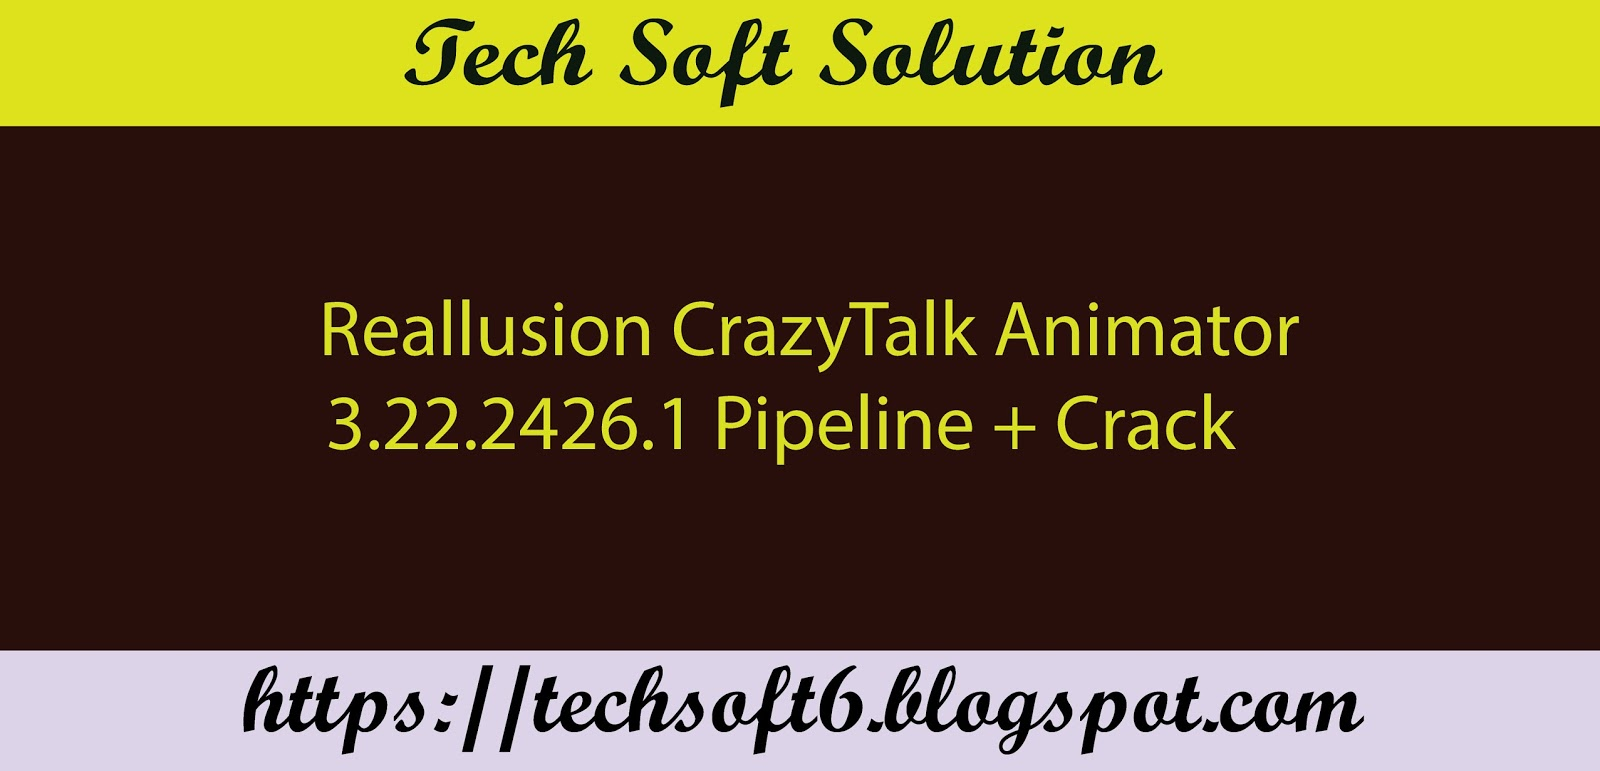 reallusion crazytalk animator 3